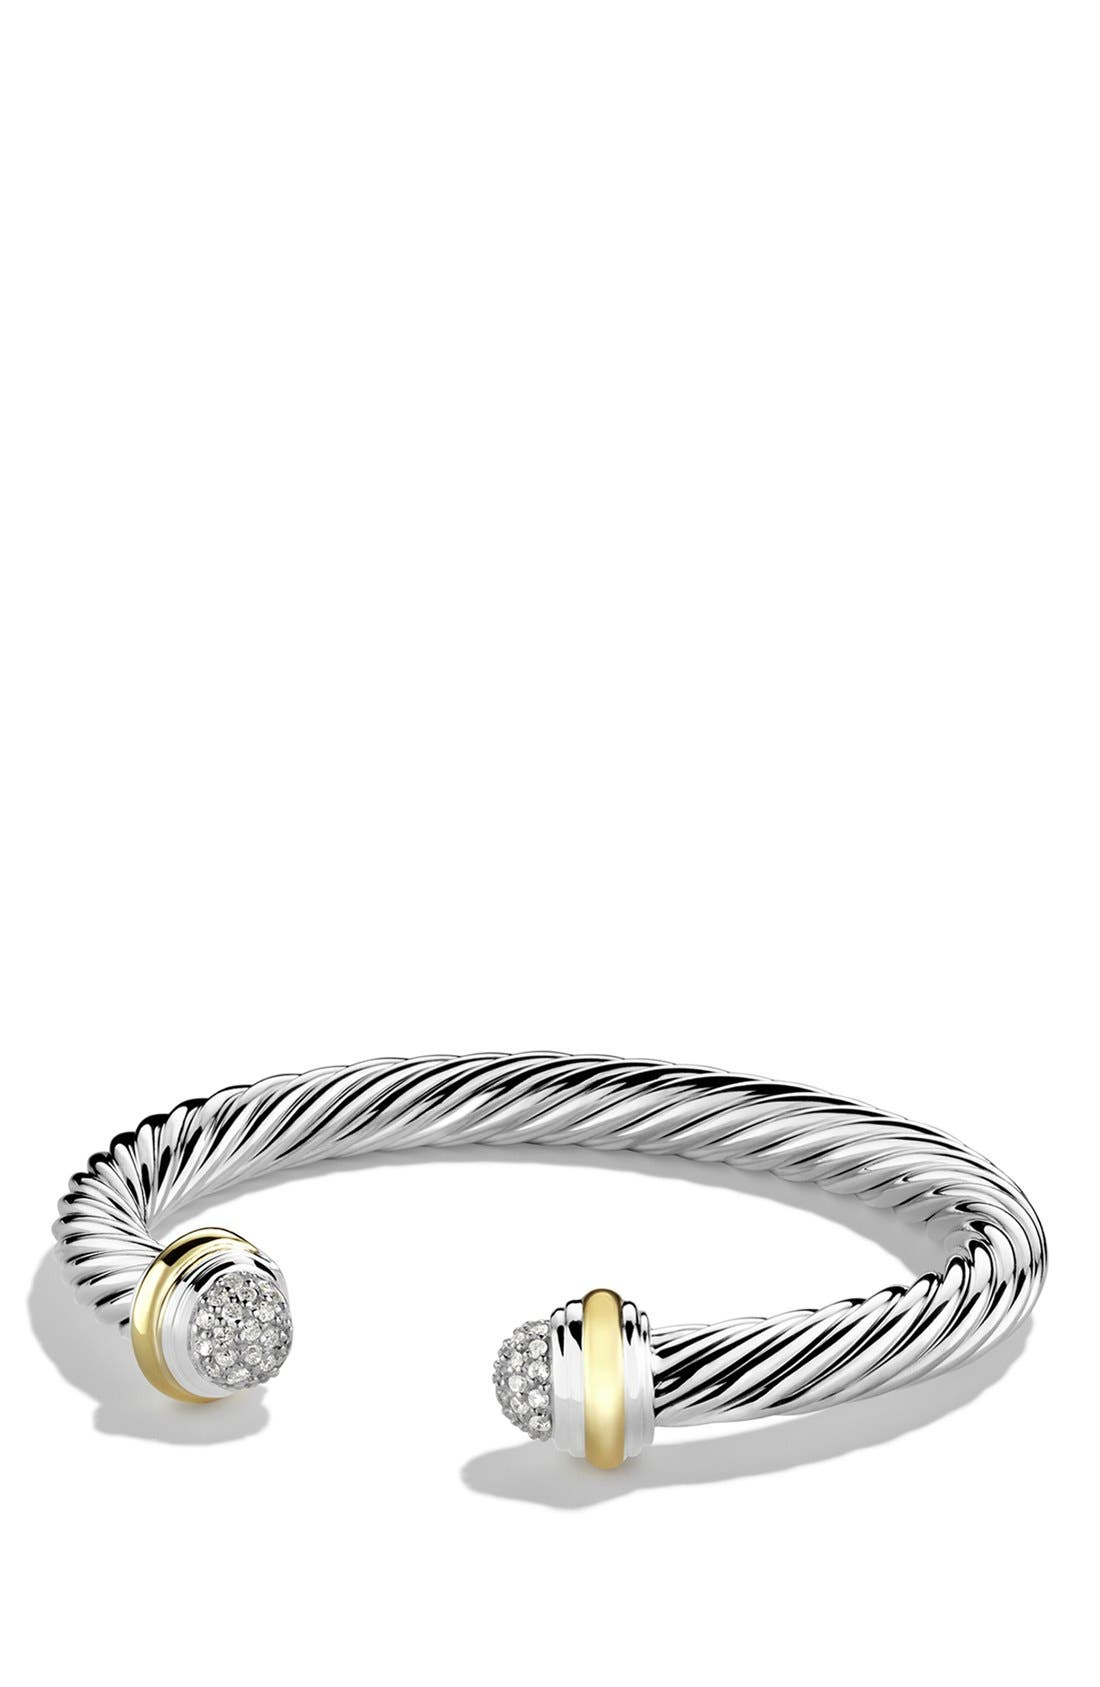 david yurman u0027cable bracelet with diamonds and gold